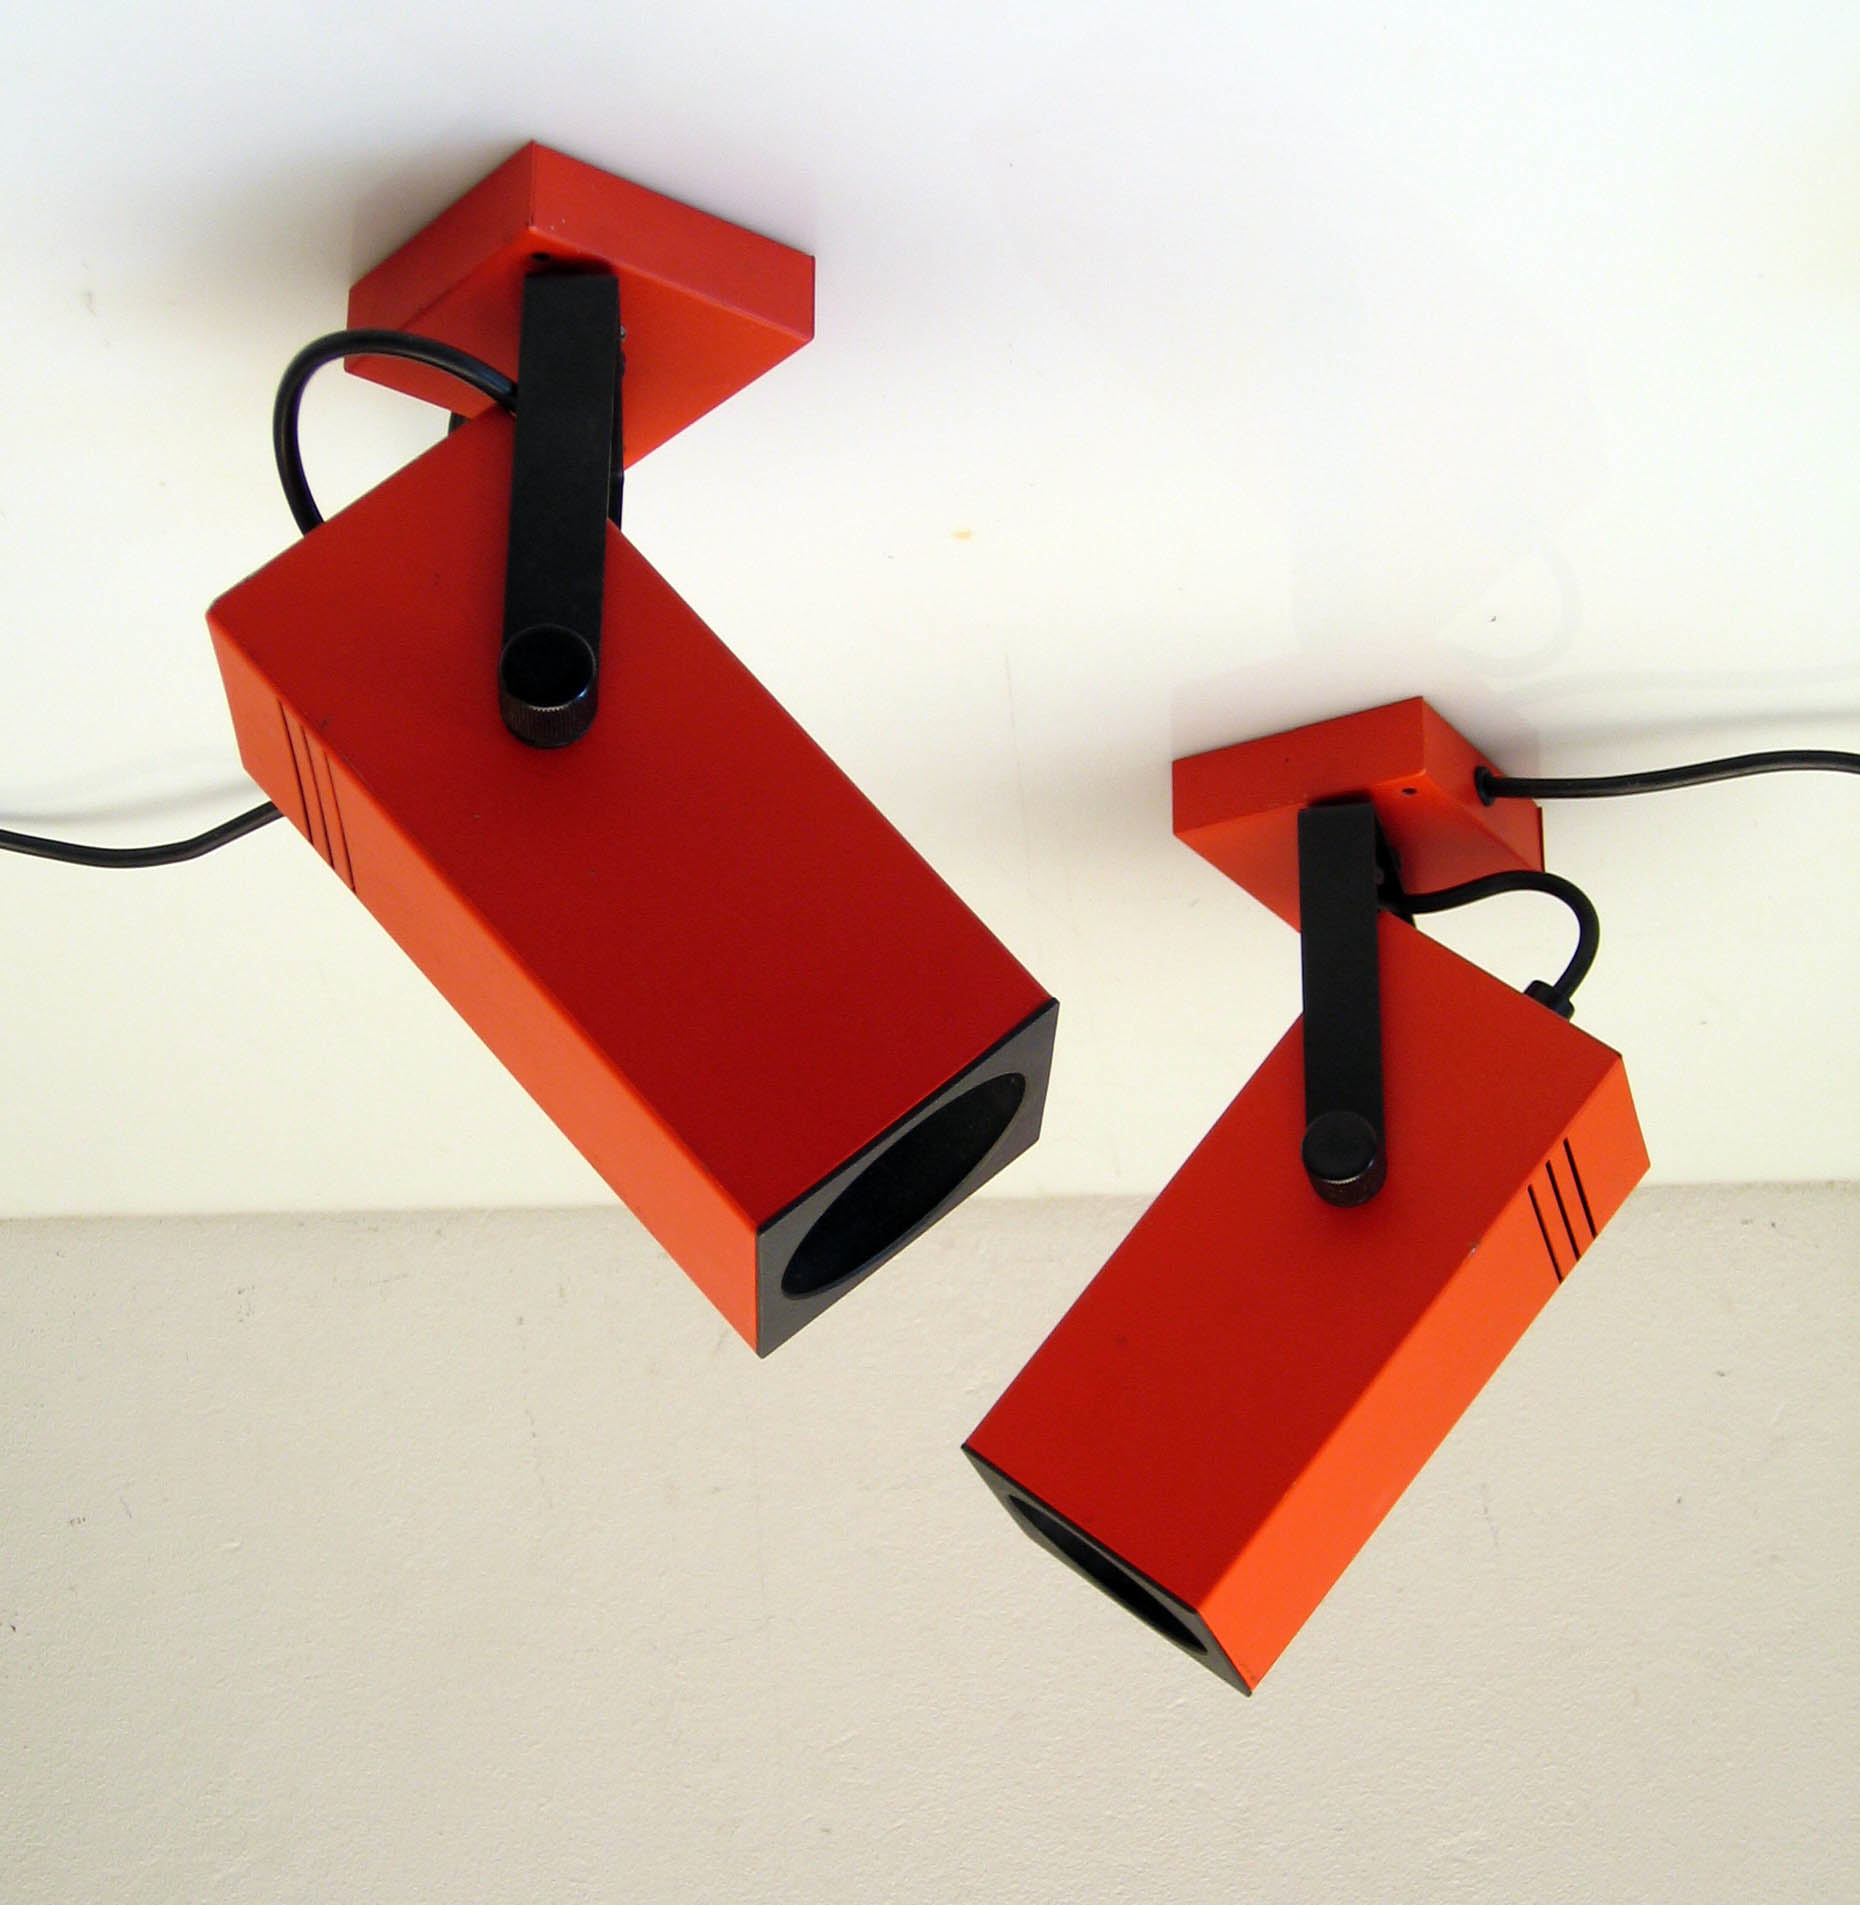 70s Philips Adjustable Spotlights Orange Sold